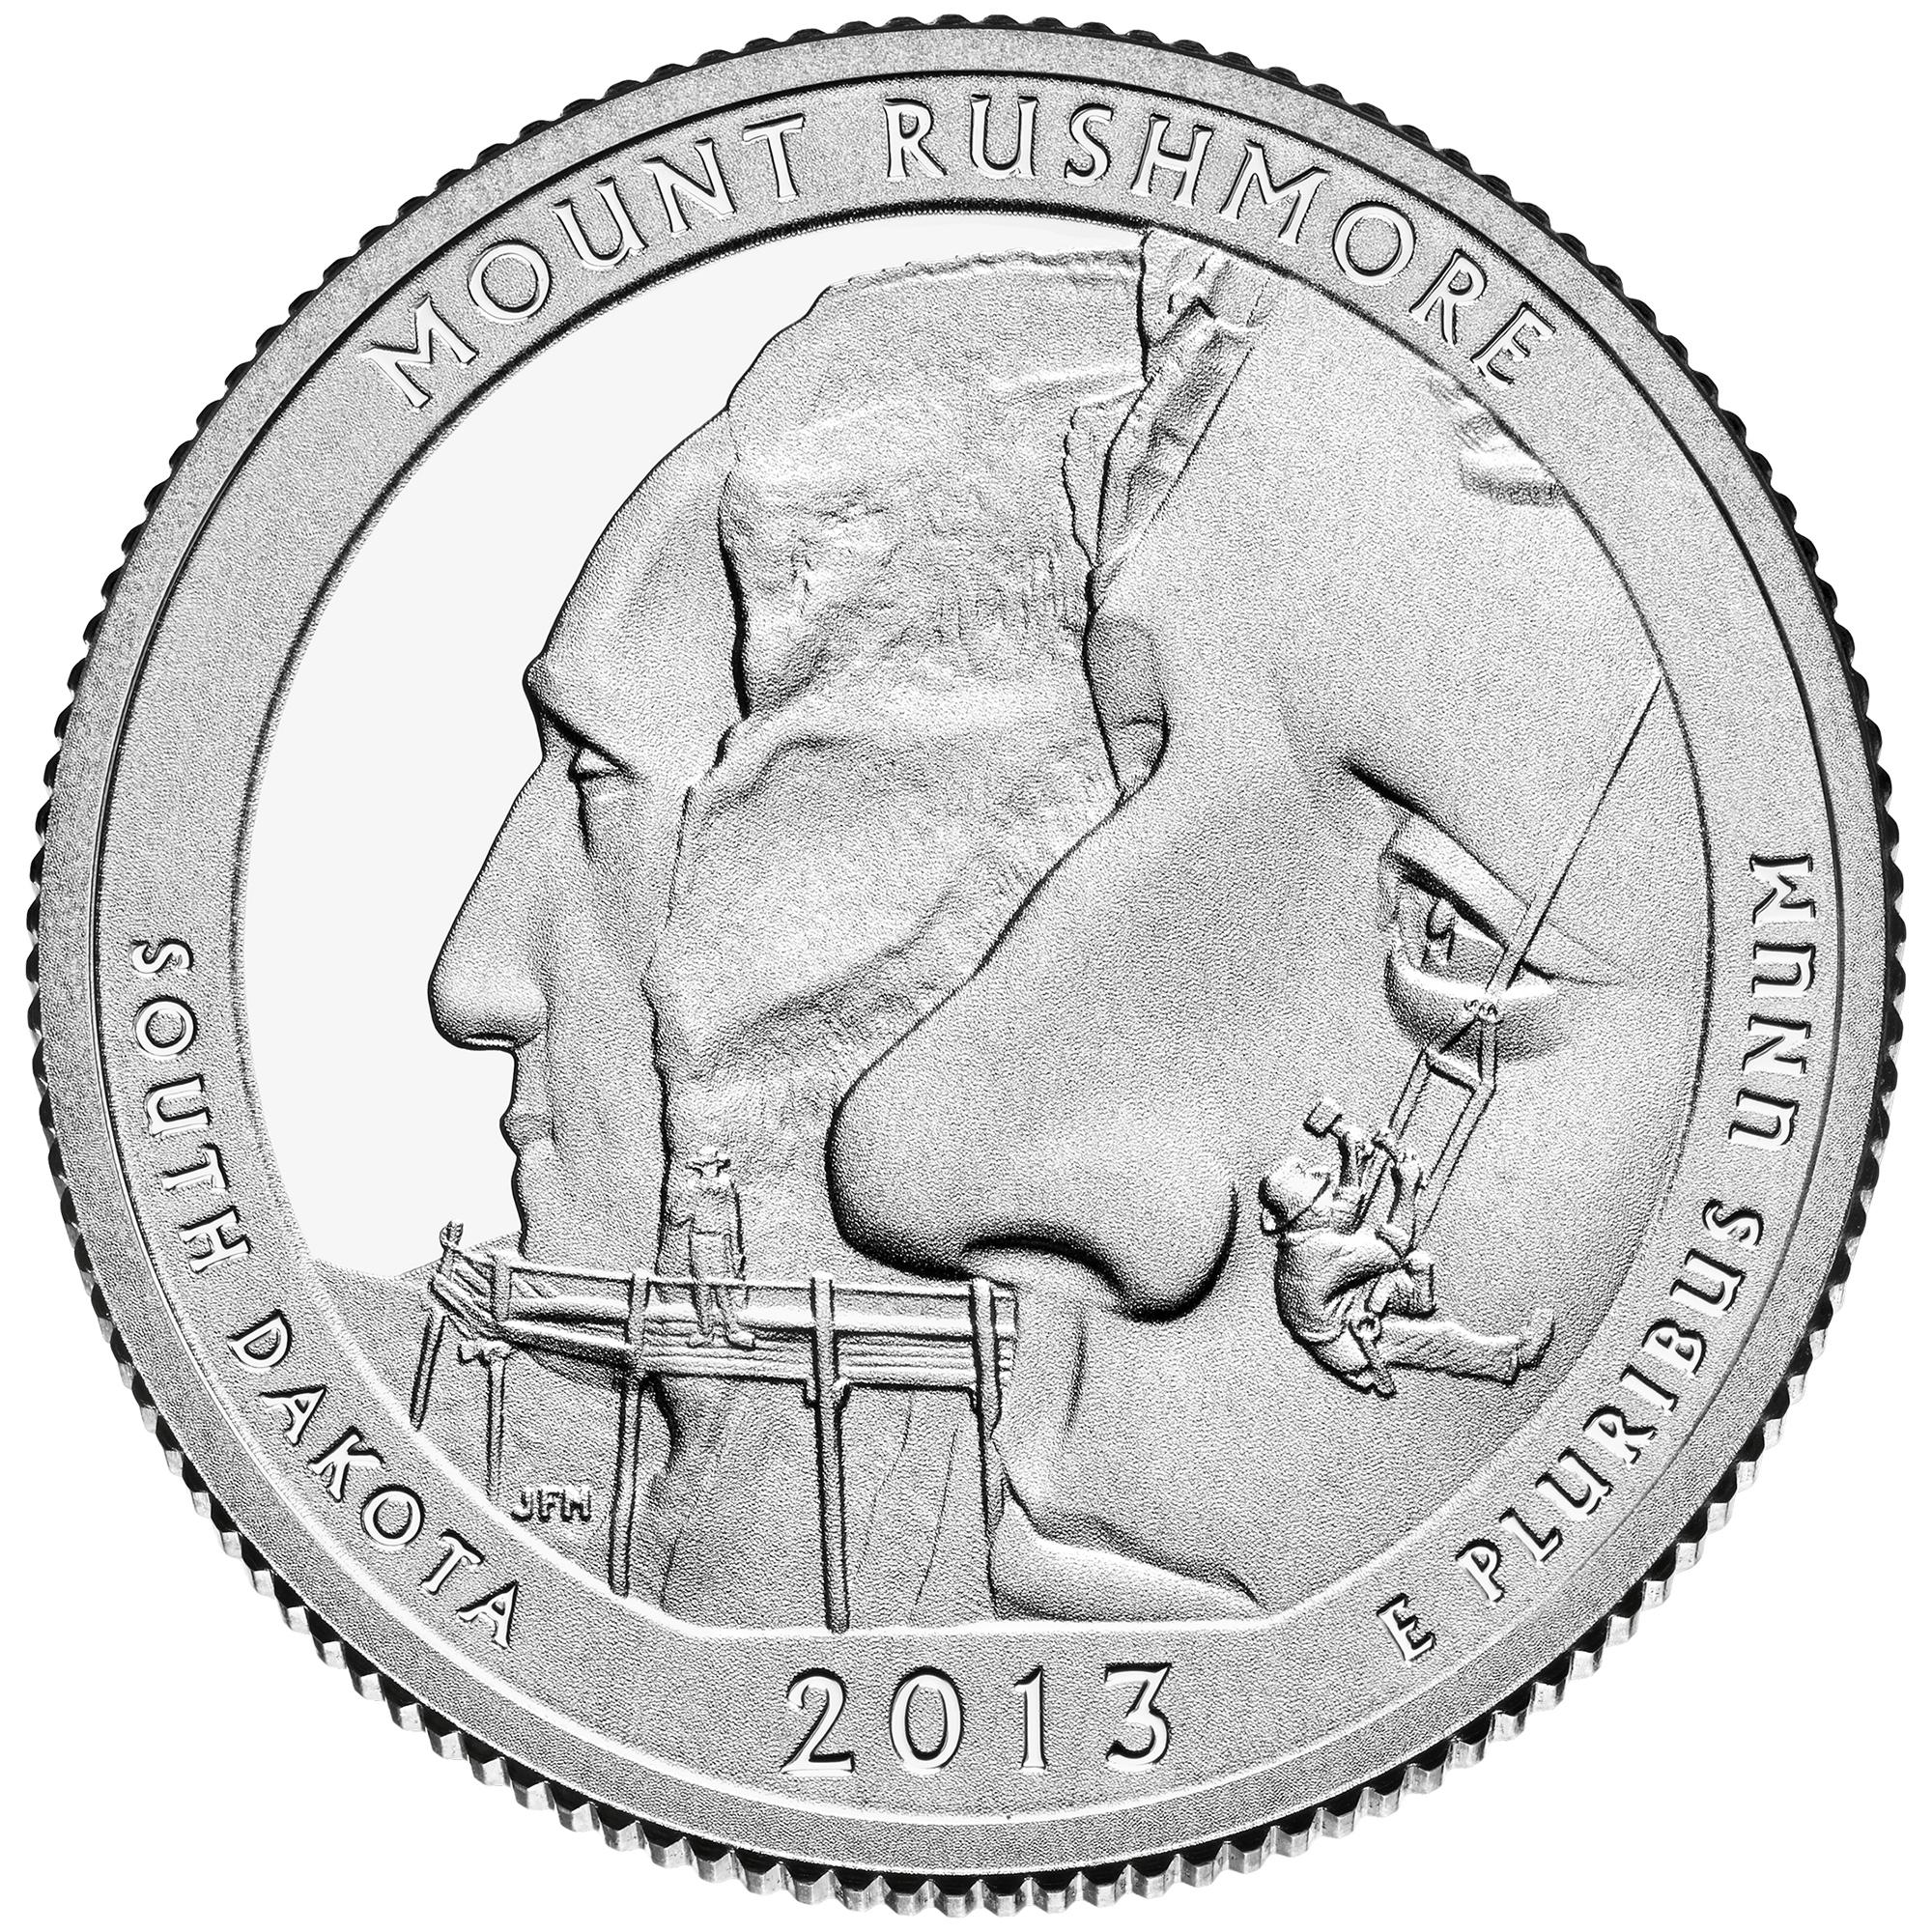 2013 America The Beautiful Quarters Coin Mount Rushmore South Dakota Proof Reverse